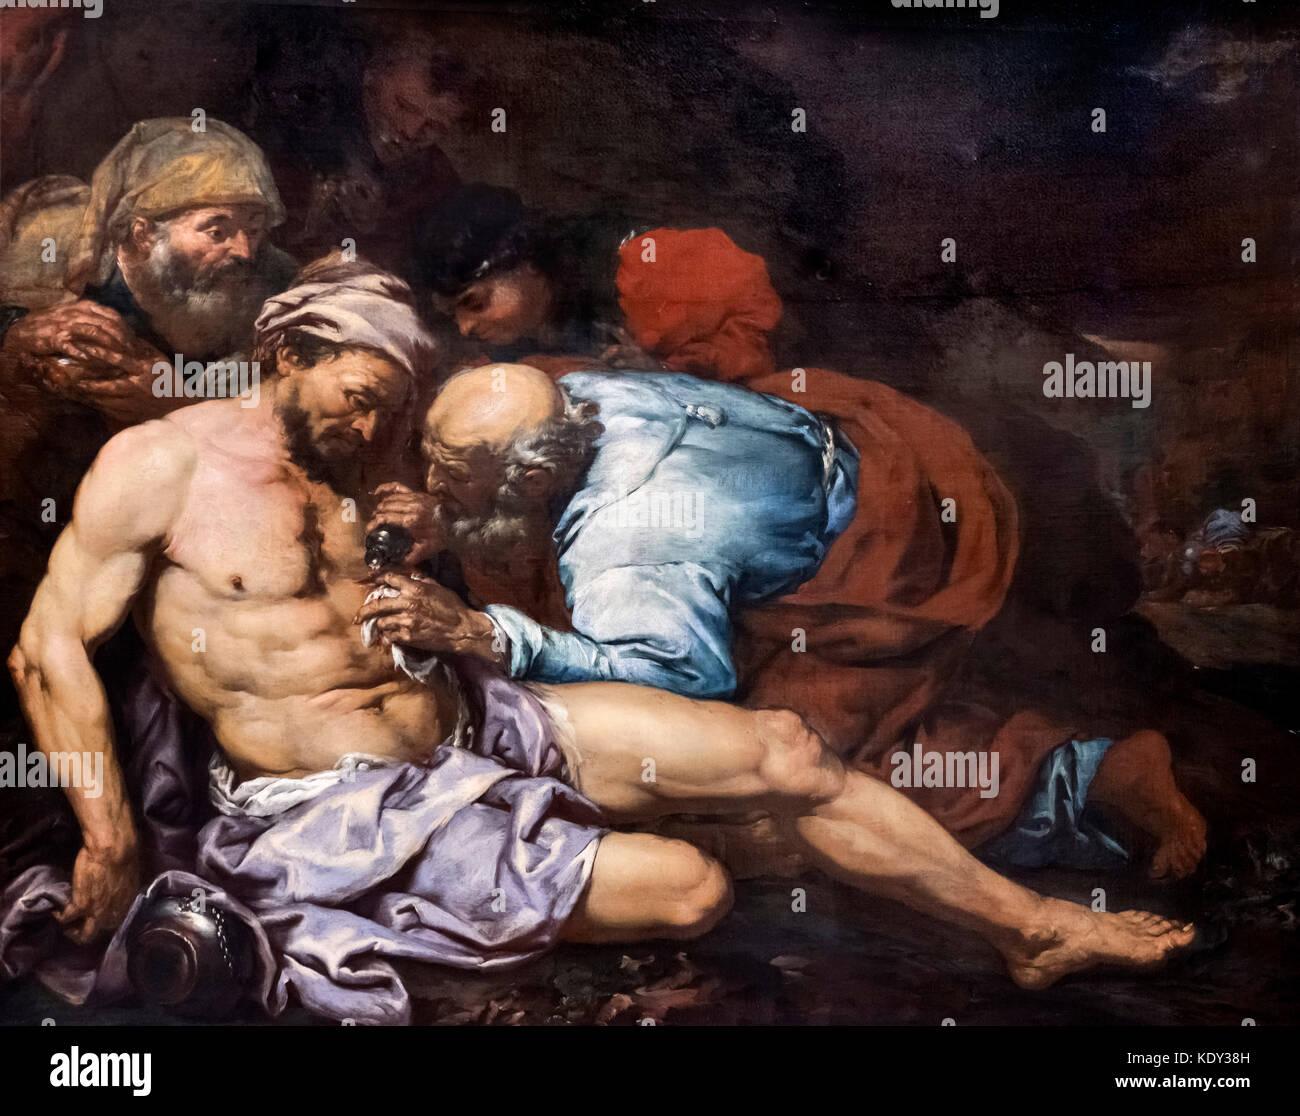 The Good Samaritan by Giovanni Battista Langetti (1625-1676), oil on canvas, c.1660-75 - Stock Image